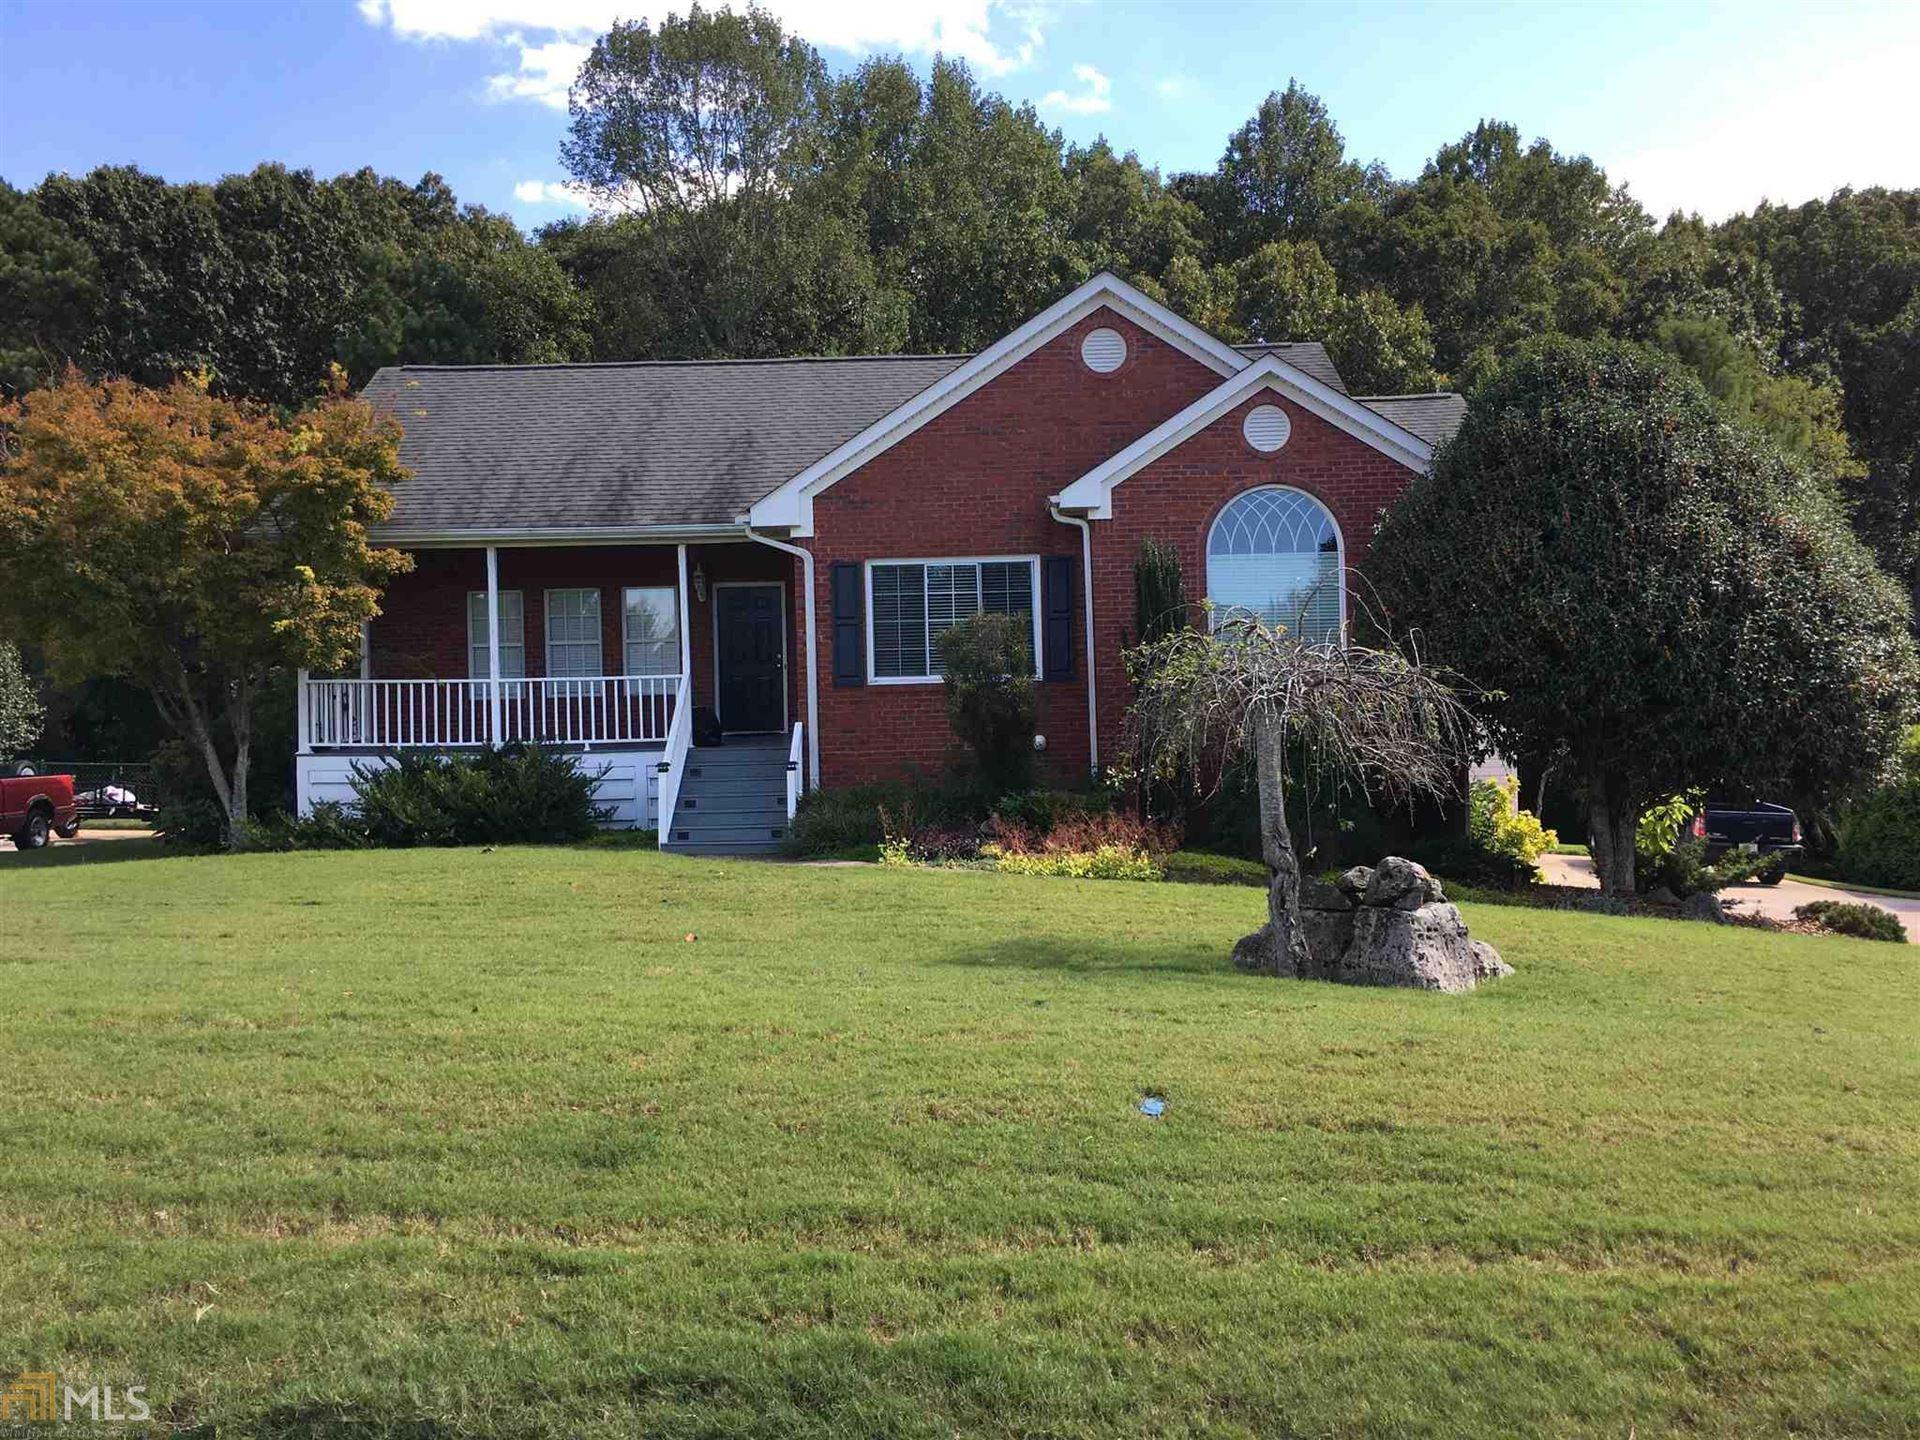 4533 Summerset Dr, Gainesville, GA 30507 - MLS#: 8872055